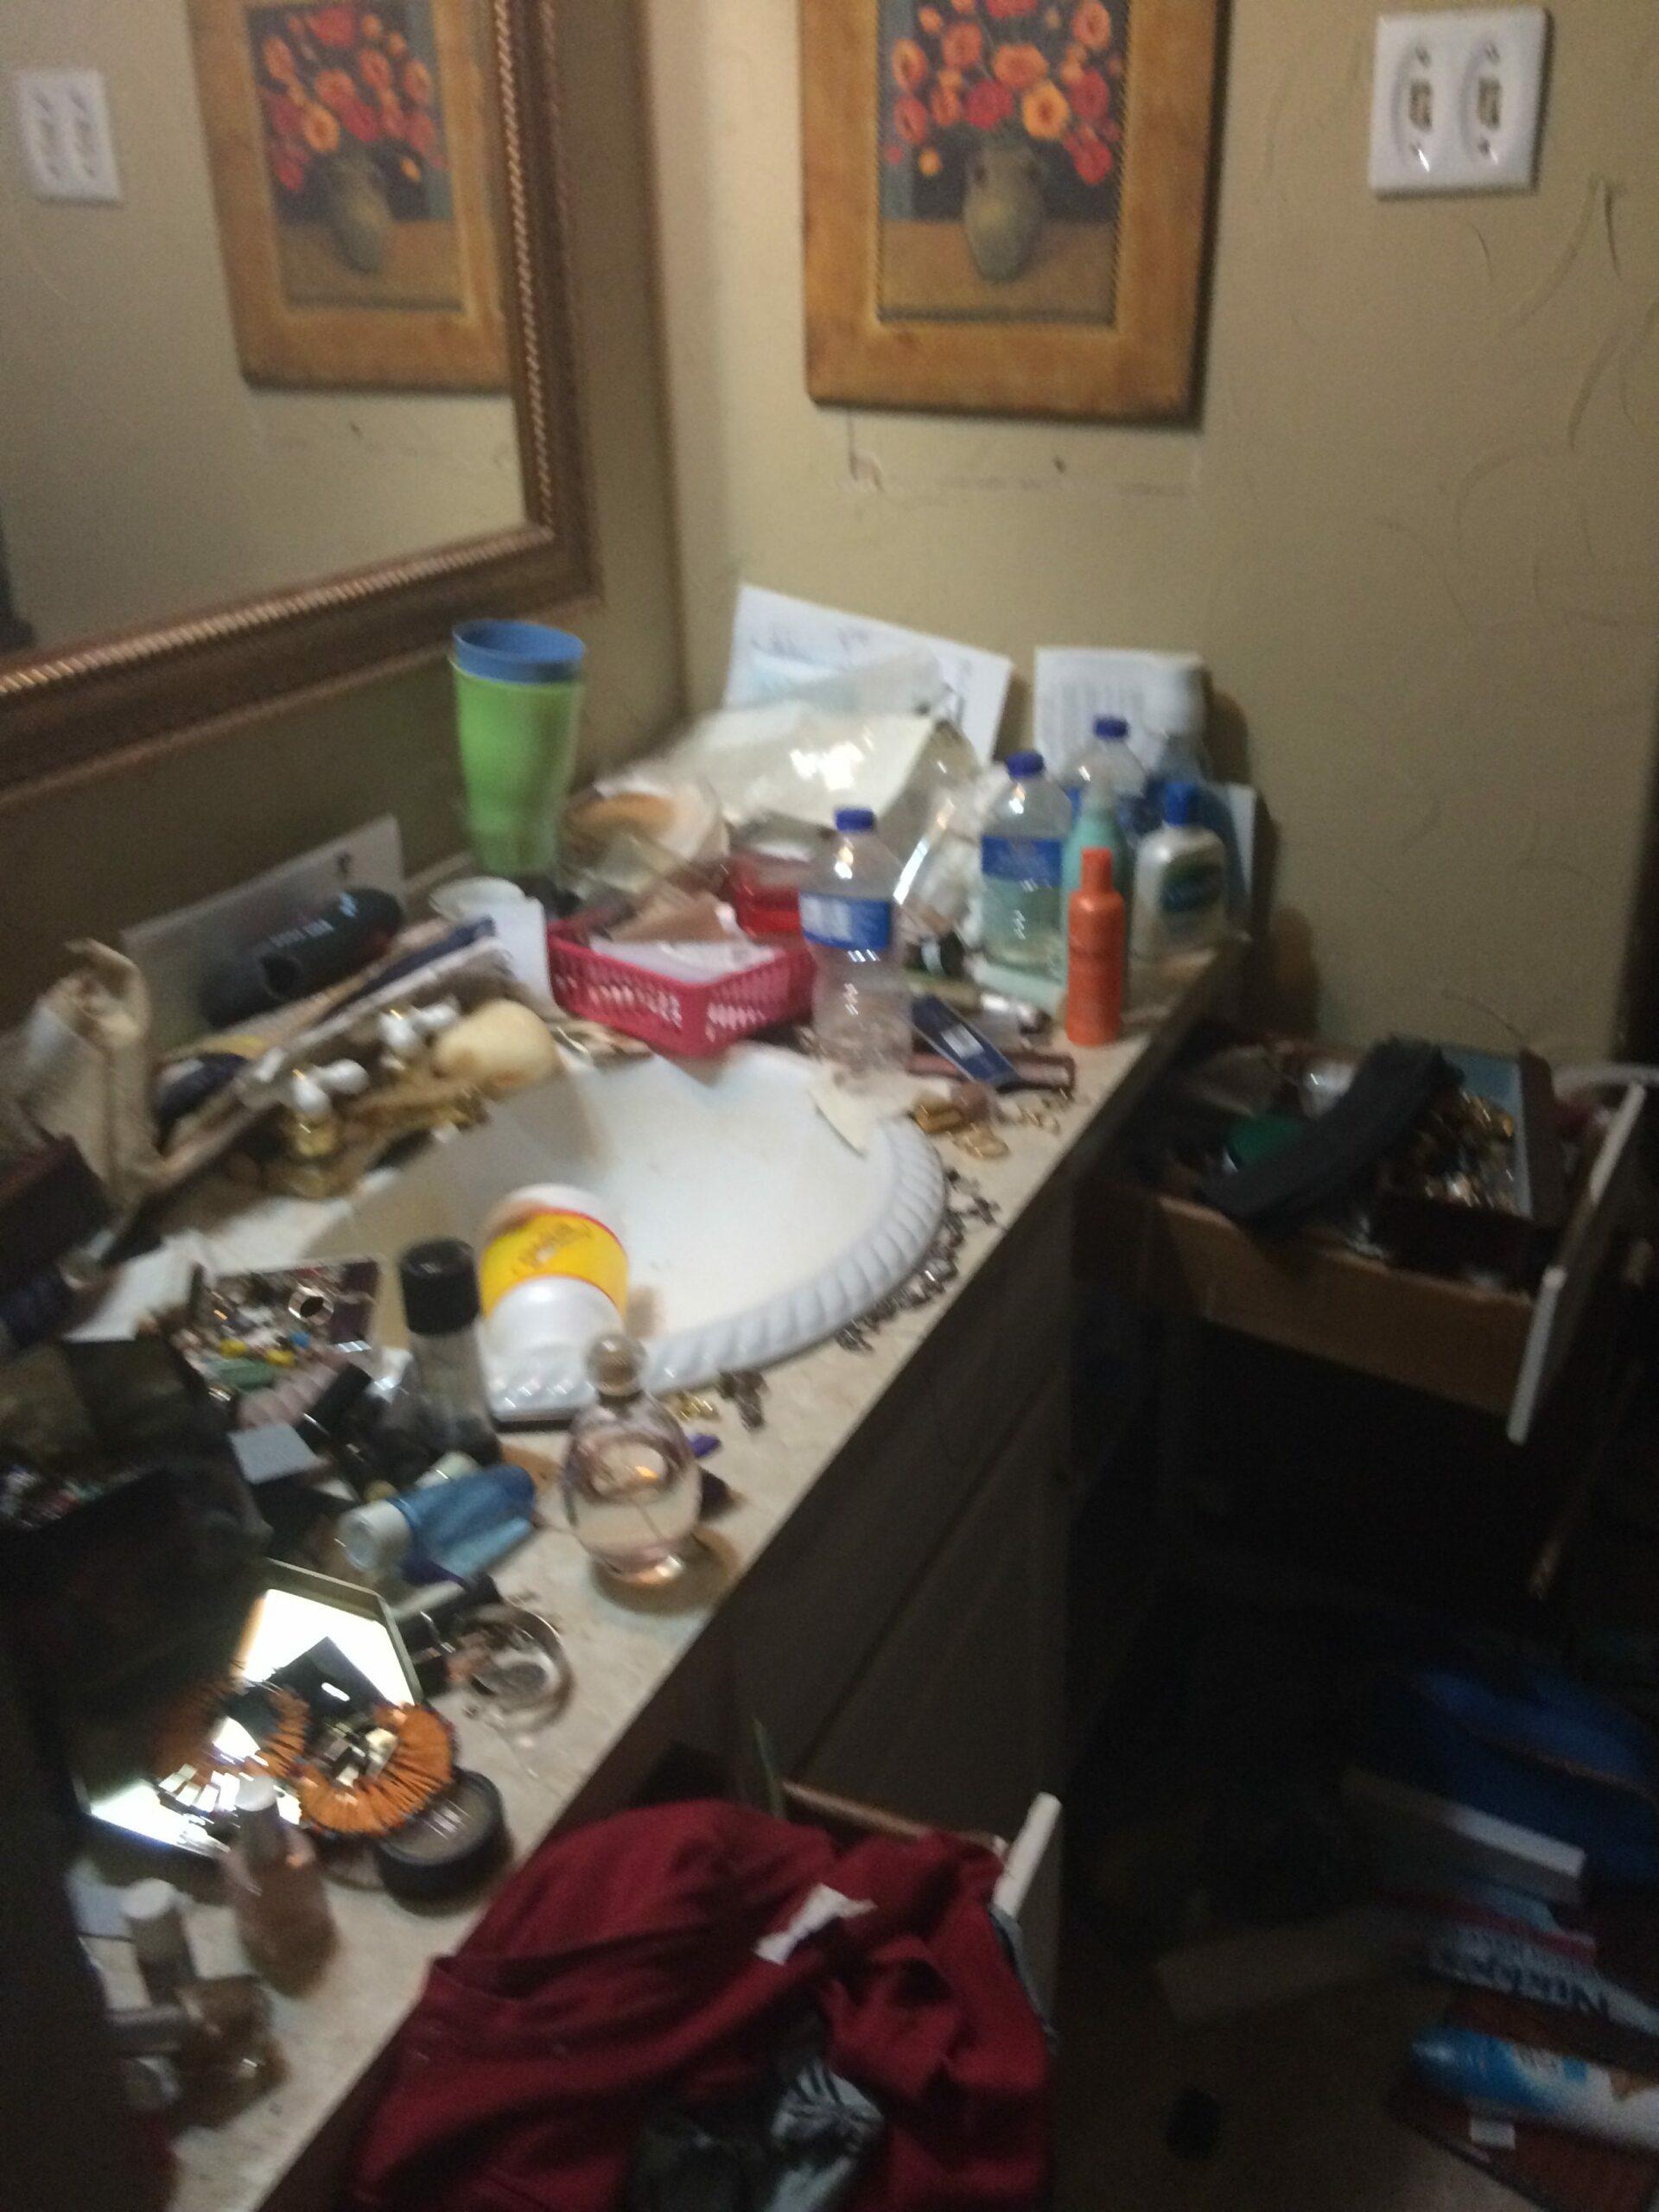 Arlington hoarder house bath vanity before